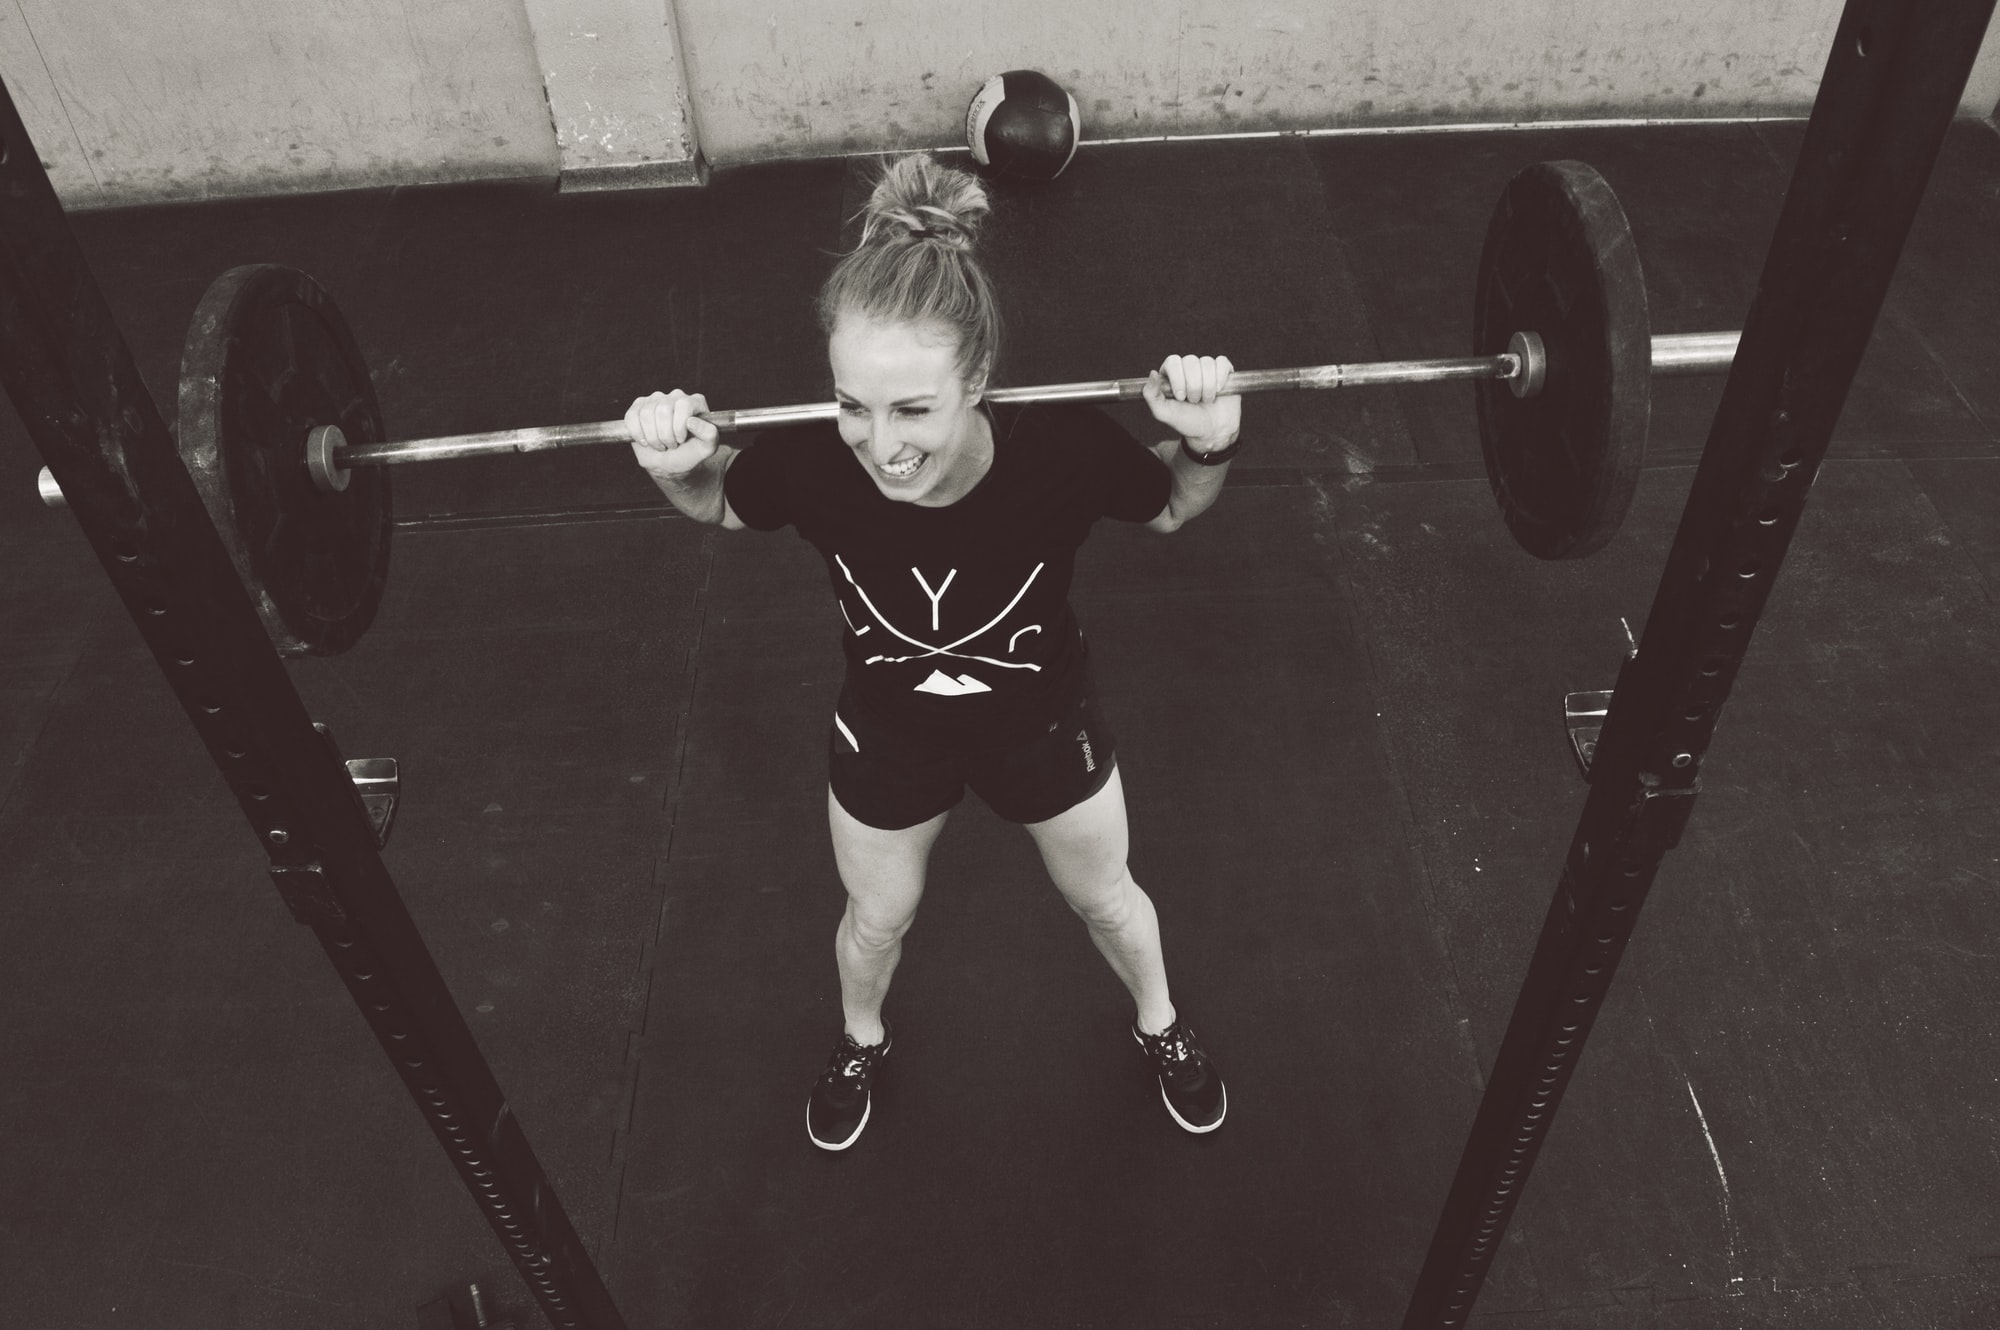 Personal training - Dunnebells